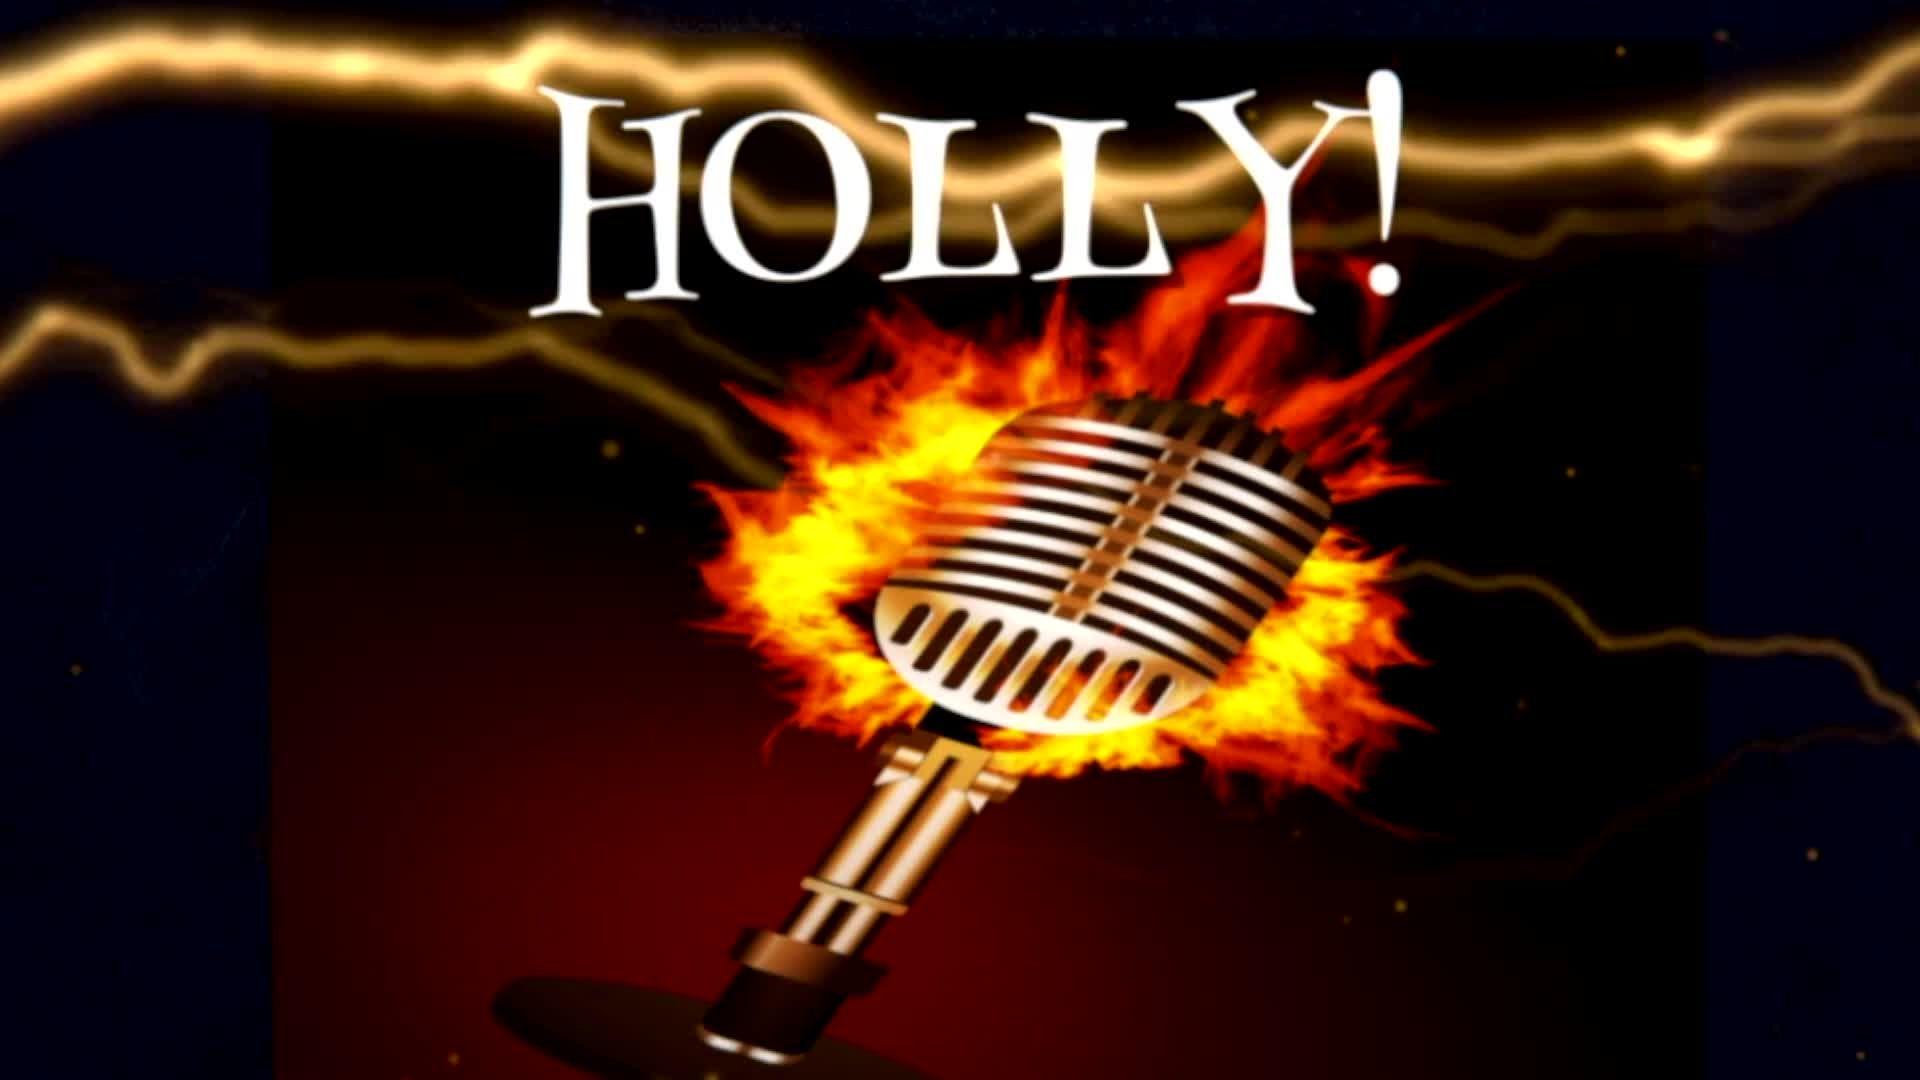 LMAO - HOLLY! - Dani Bee